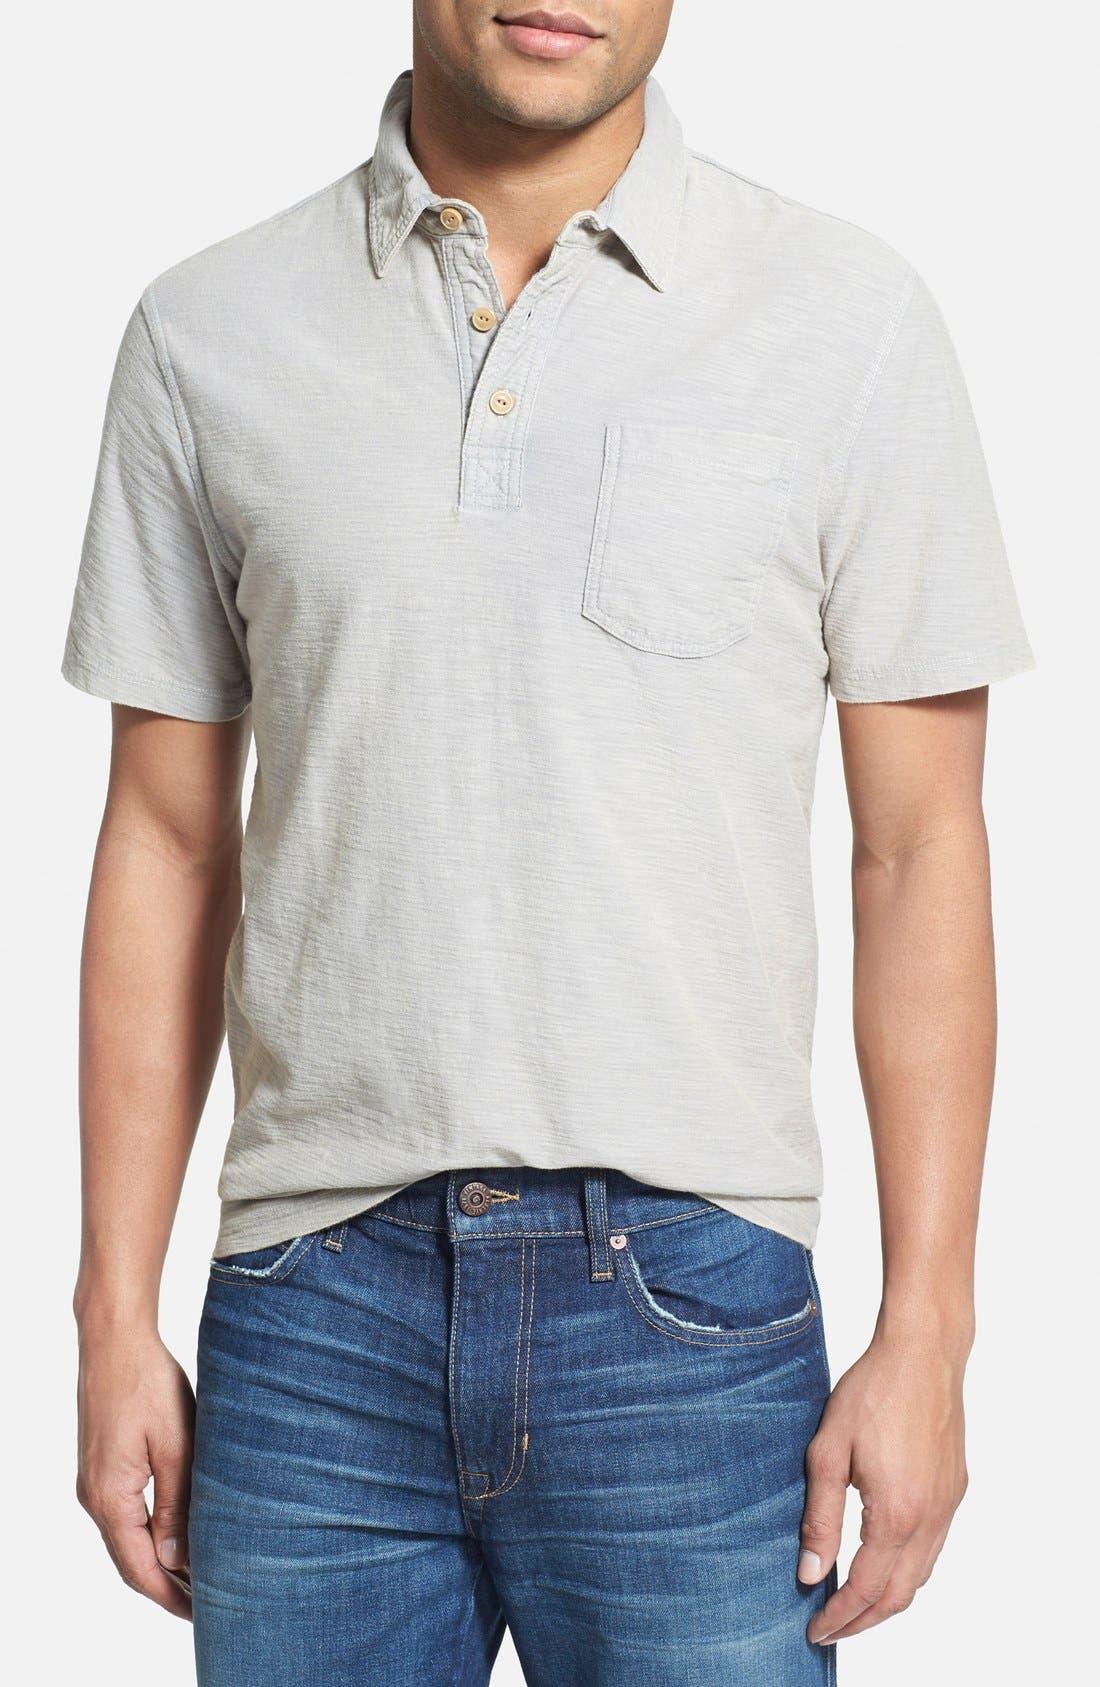 WALLIN & BROS. 'Workwear' Short Sleeve Polo, Main, color, 030